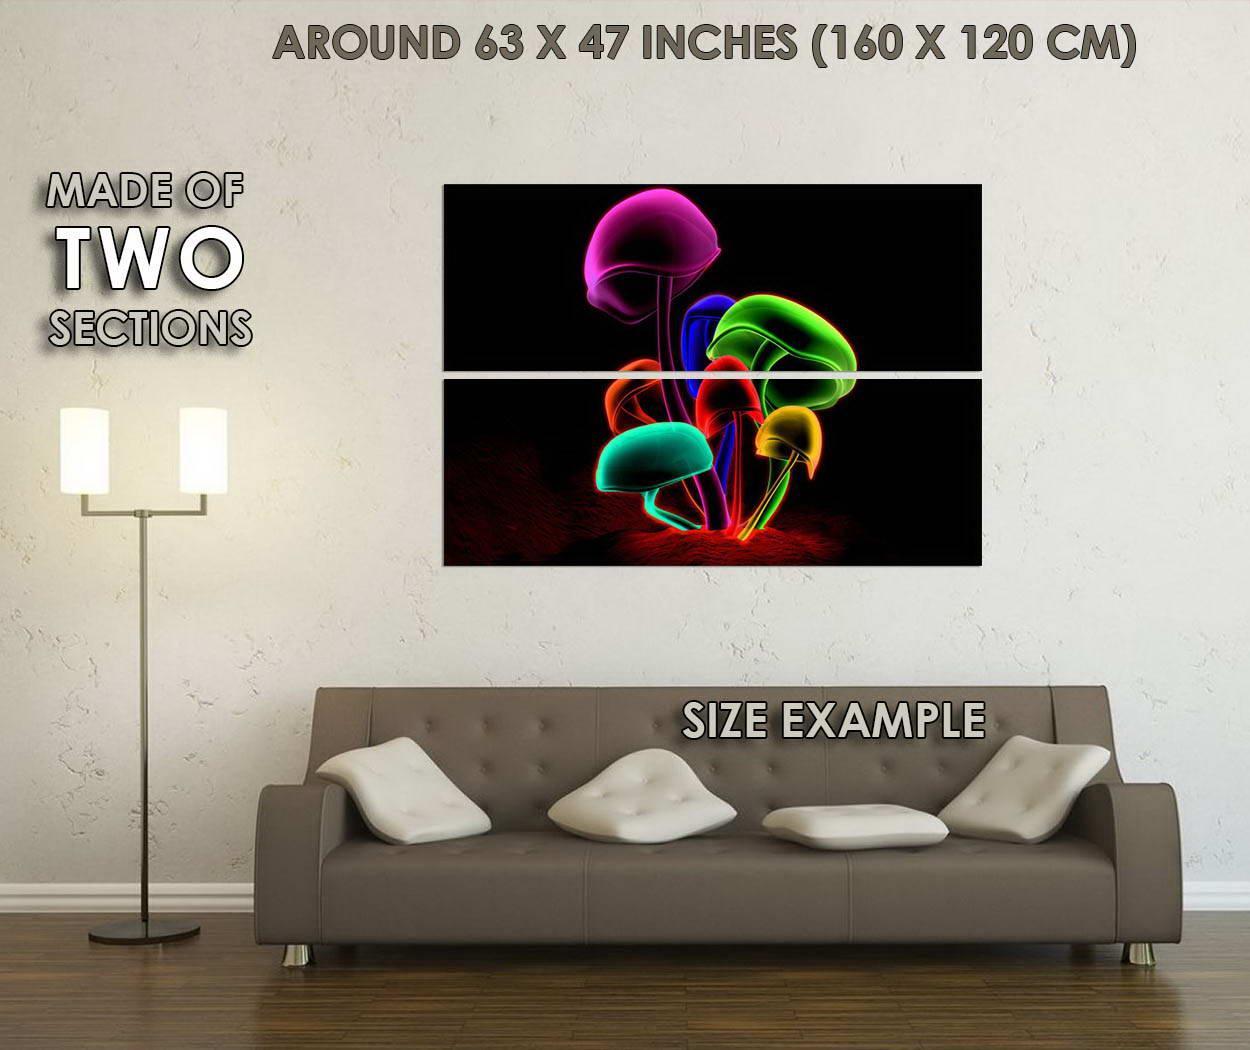 10809-Psychedelic-Trippy-Magic-Mushroom-Abstract-Art-LAMINATED-POSTER-CA thumbnail 6